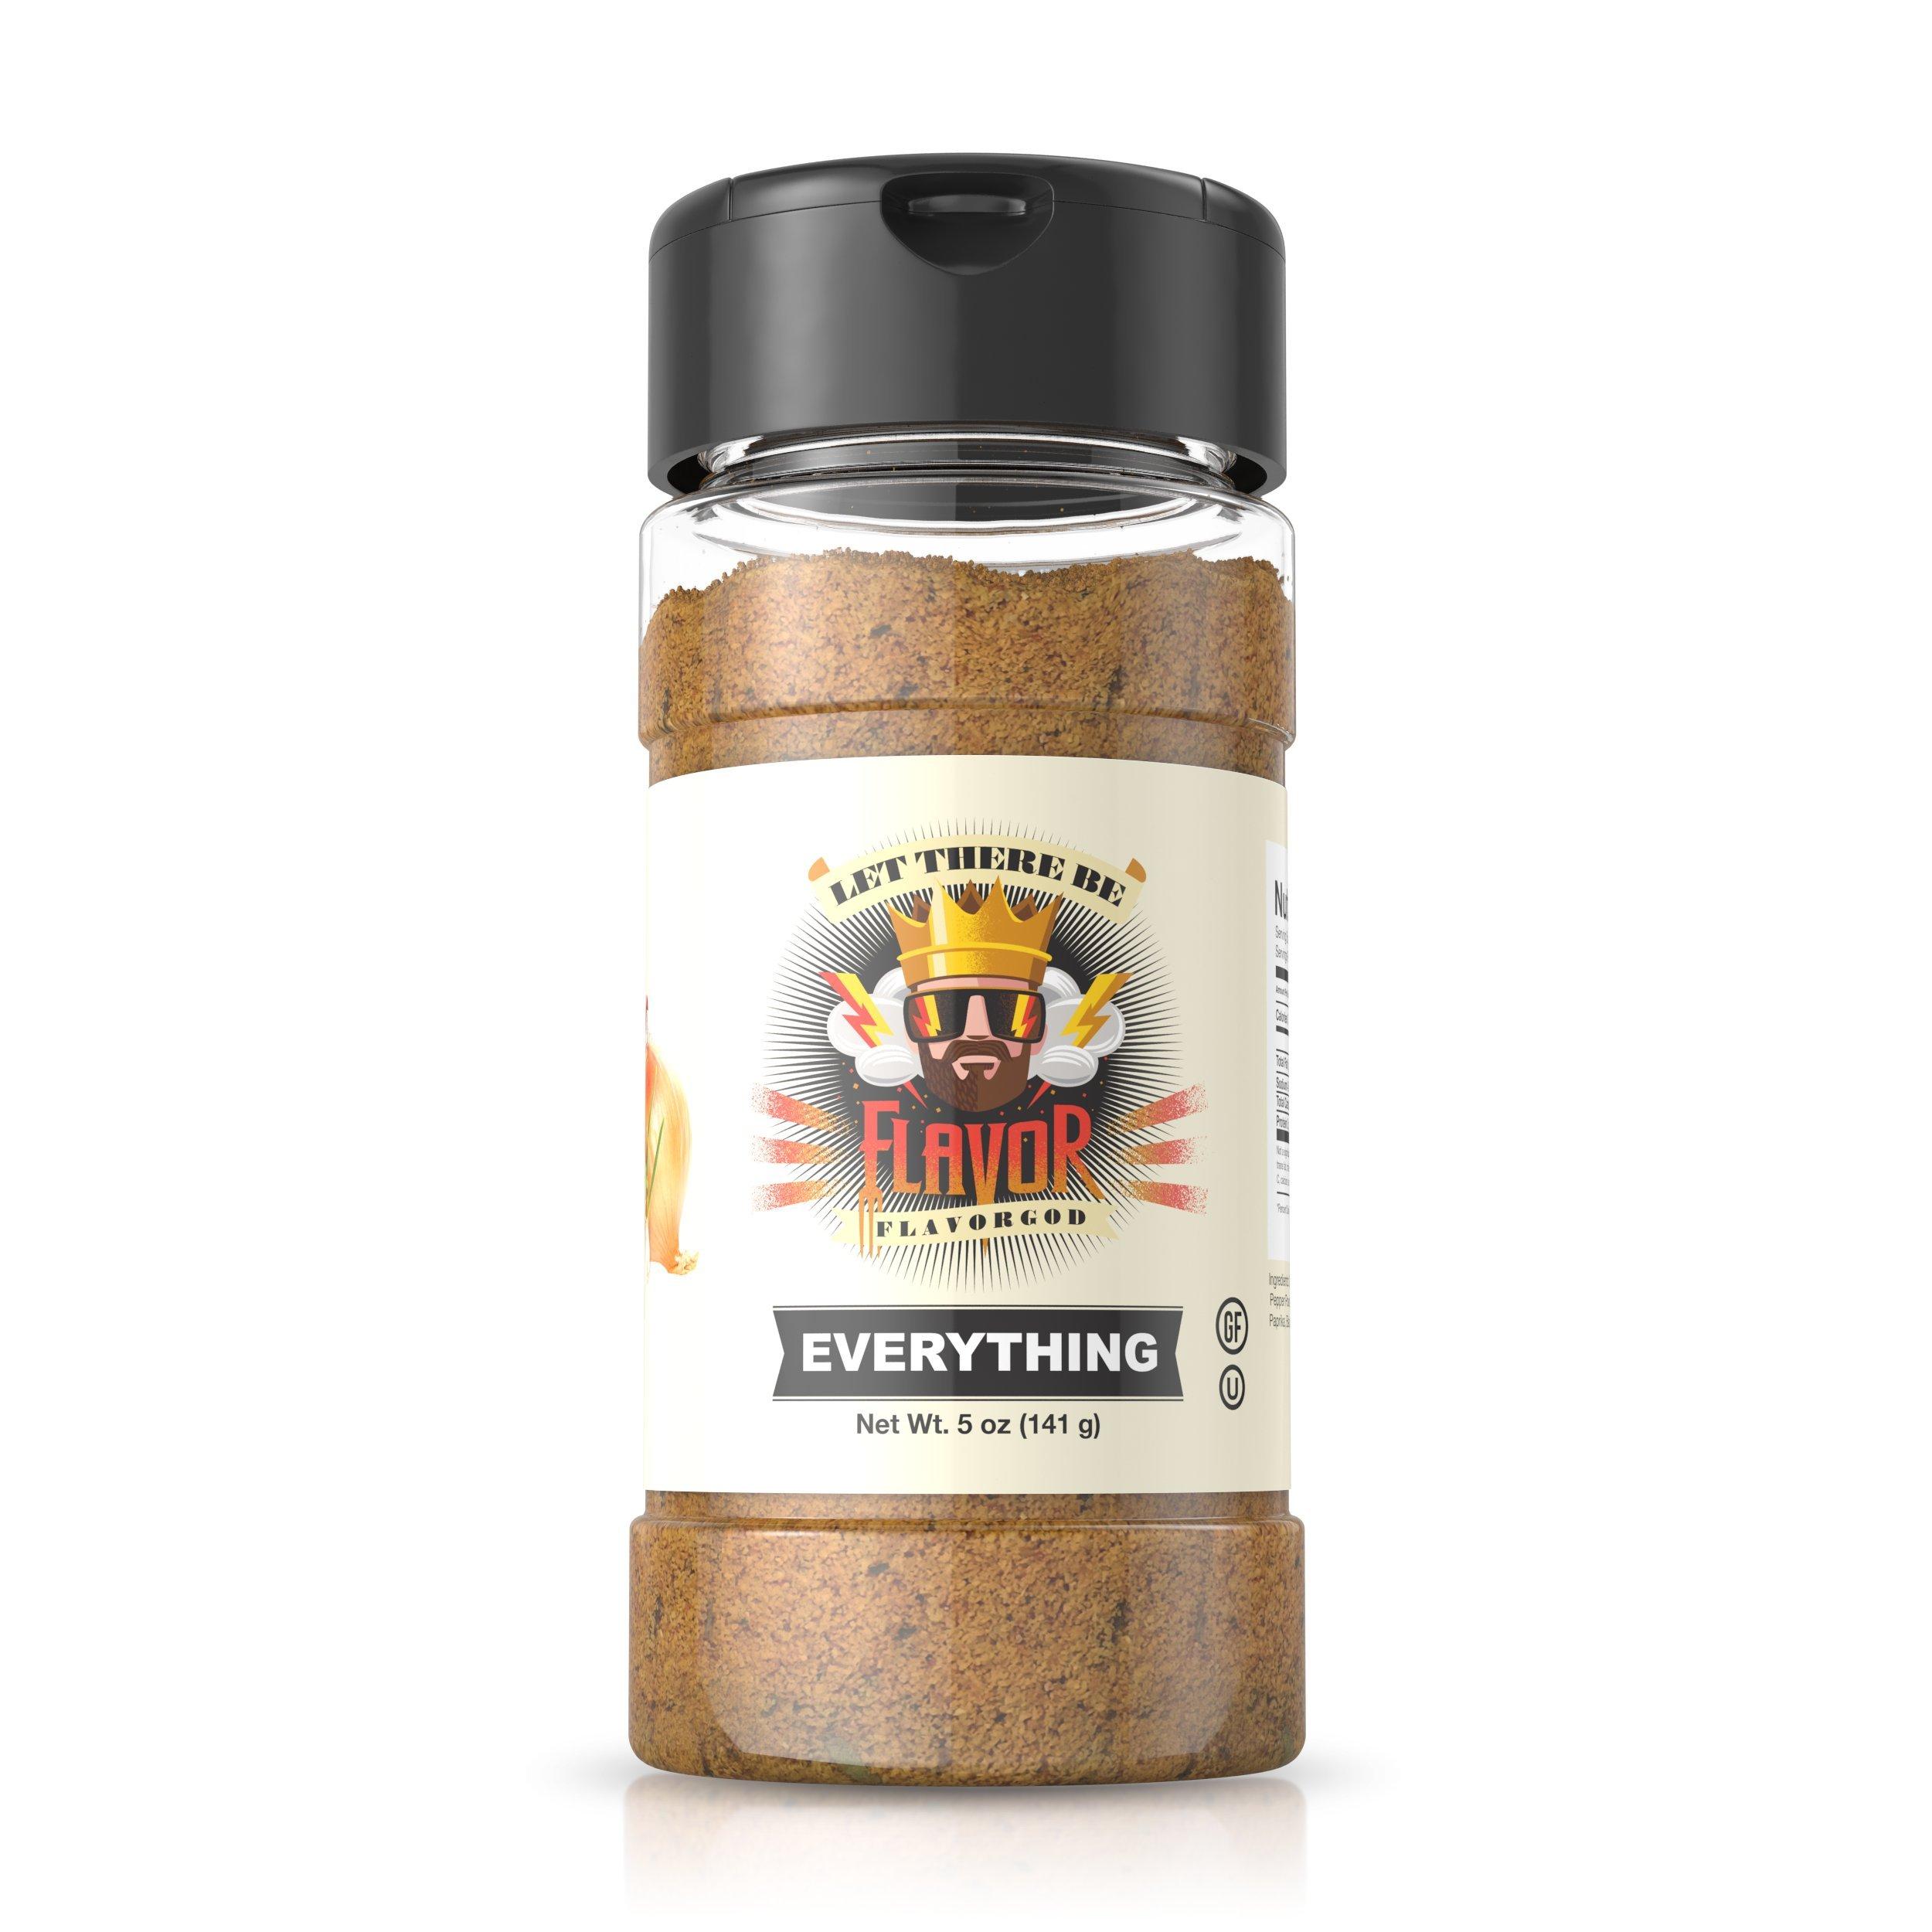 Flavor God Best-Selling Everything Seasonings, Gluten Free, Low Sodium, Paleo, Vegan, No MSG, Kosher Certified 5oz